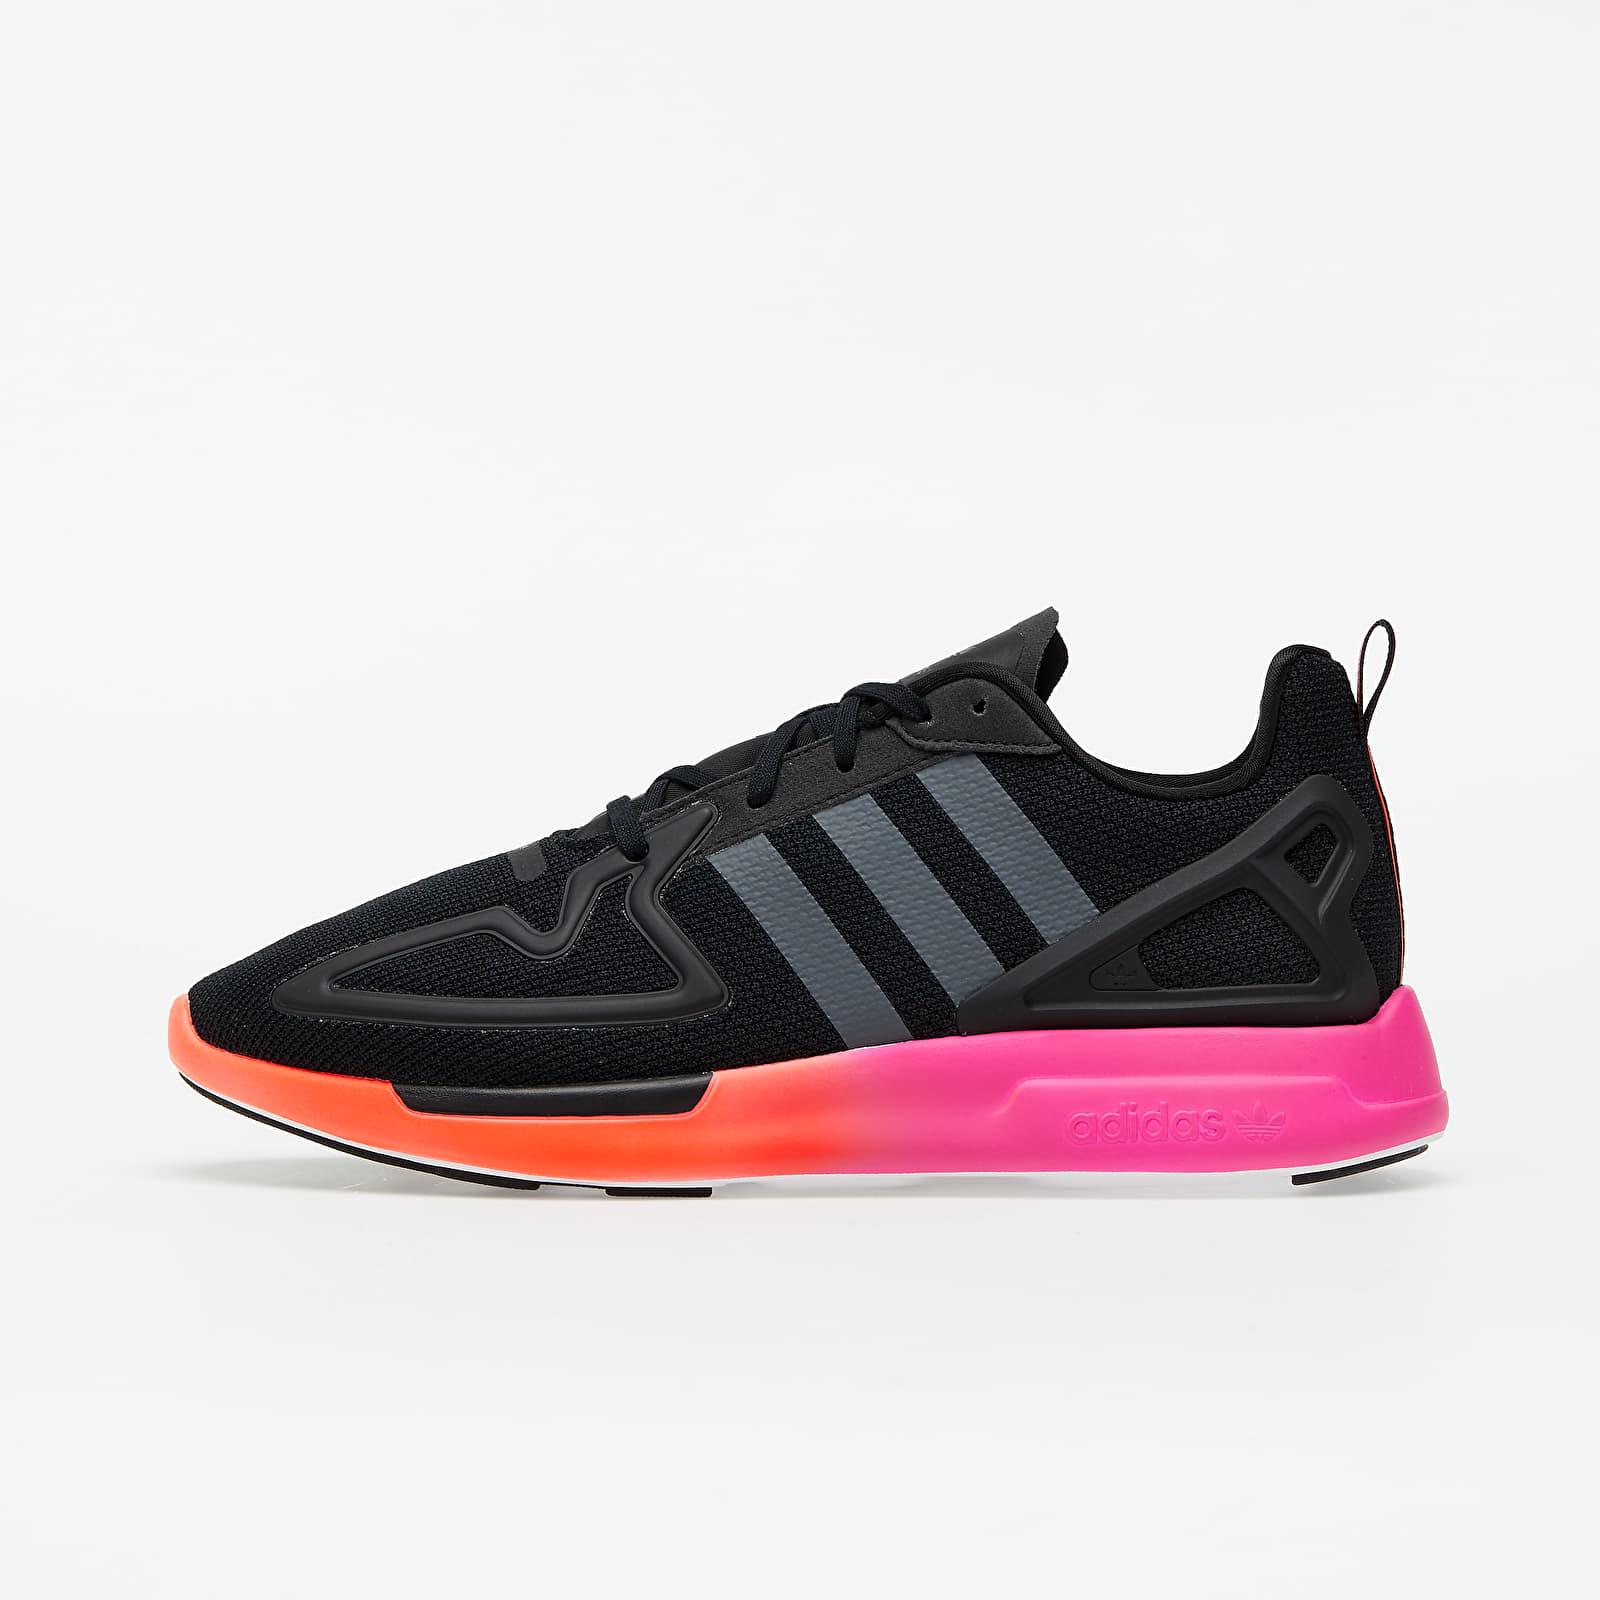 Pánské tenisky a boty adidas ZX 2K Flux Core Black/ Grey Six/ Shock Pink